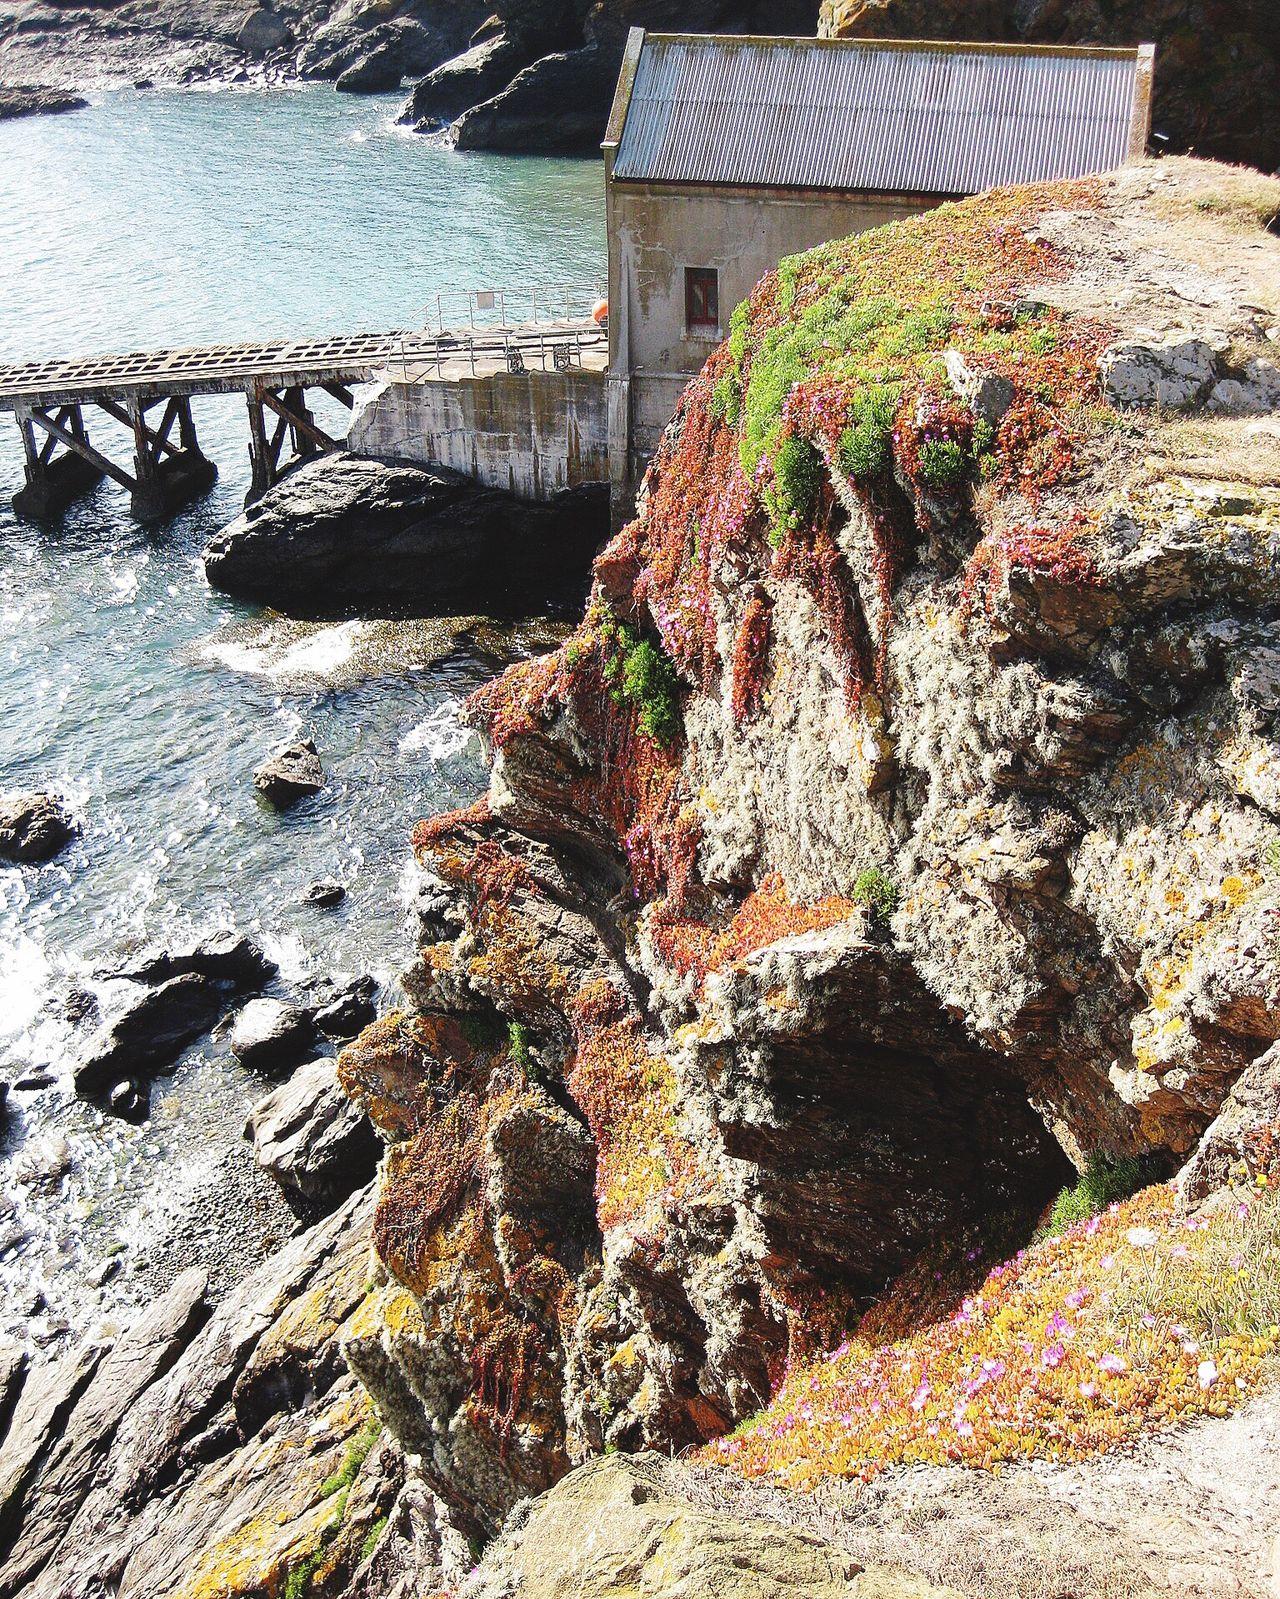 Beauty In Nature Cornwall Cornish Coast Lizard Peninsula Lifeboat Station... Rock - Object Cliff Beautiful scenery Neighborhood Map The Great Outdoors - 2017 EyeEm Awards